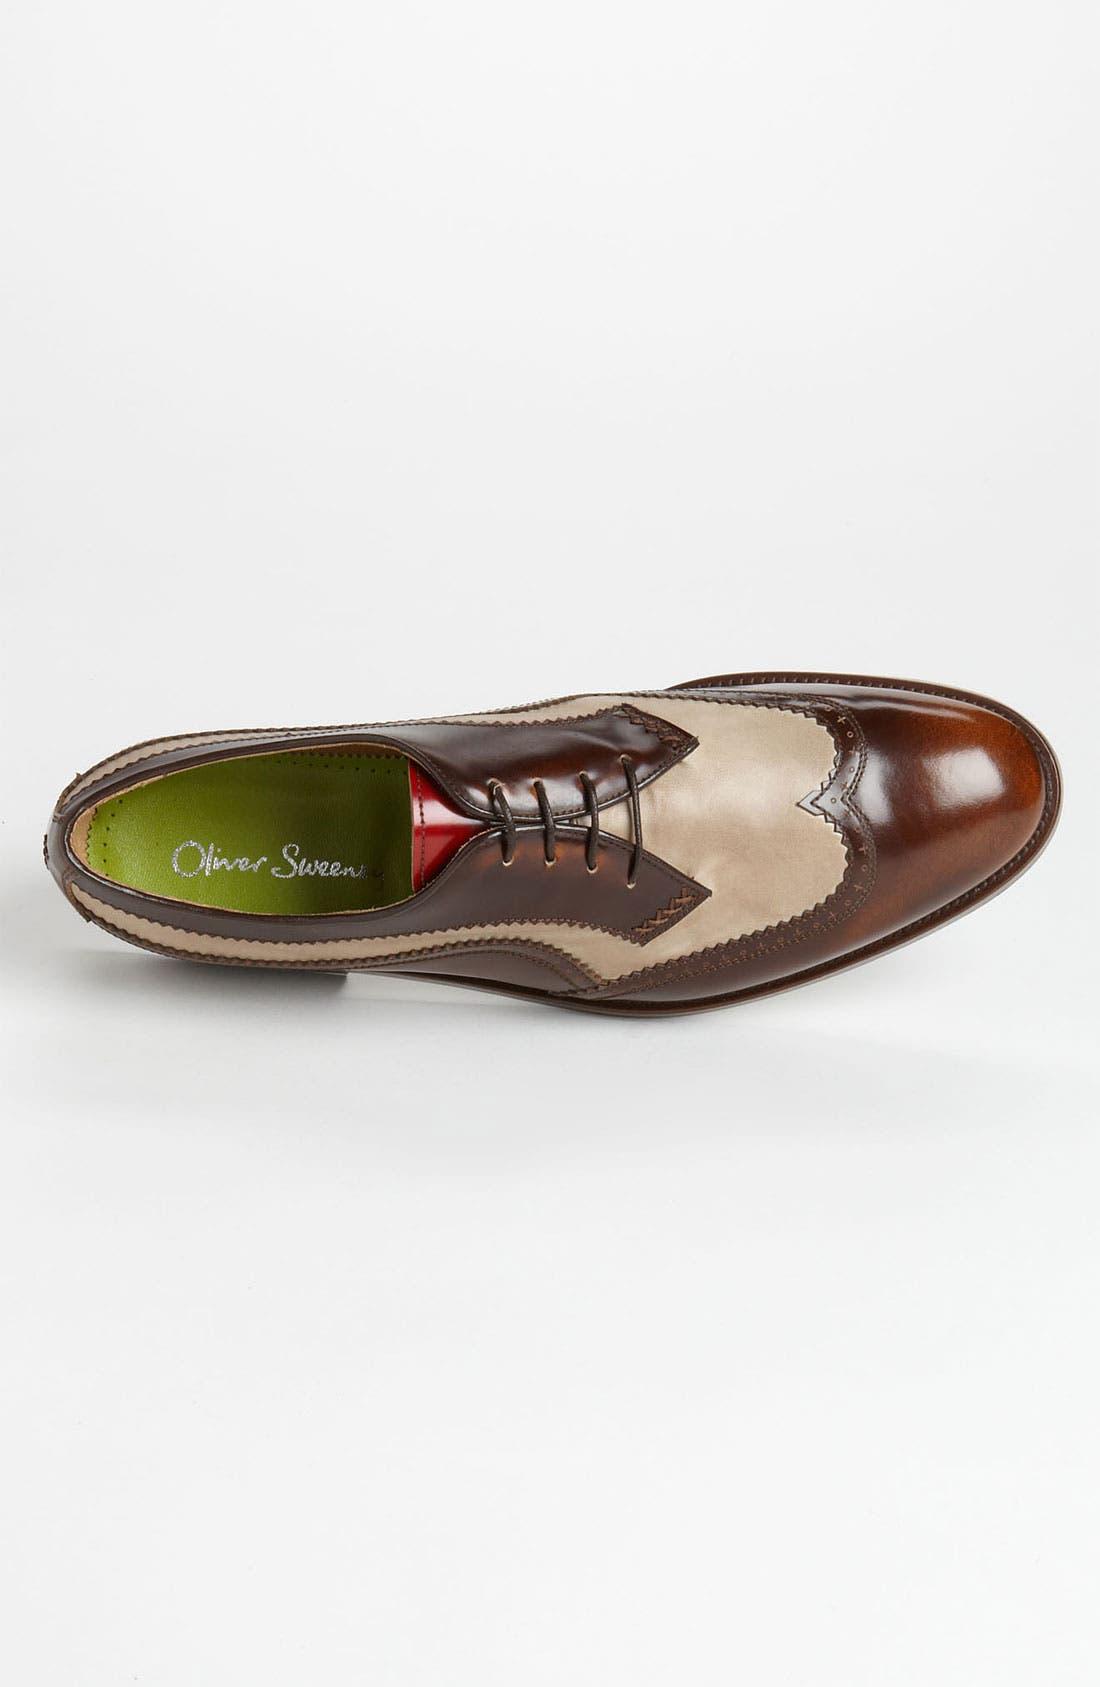 Alternate Image 3  - Oliver Sweeney 'Salento' Spectator Shoe